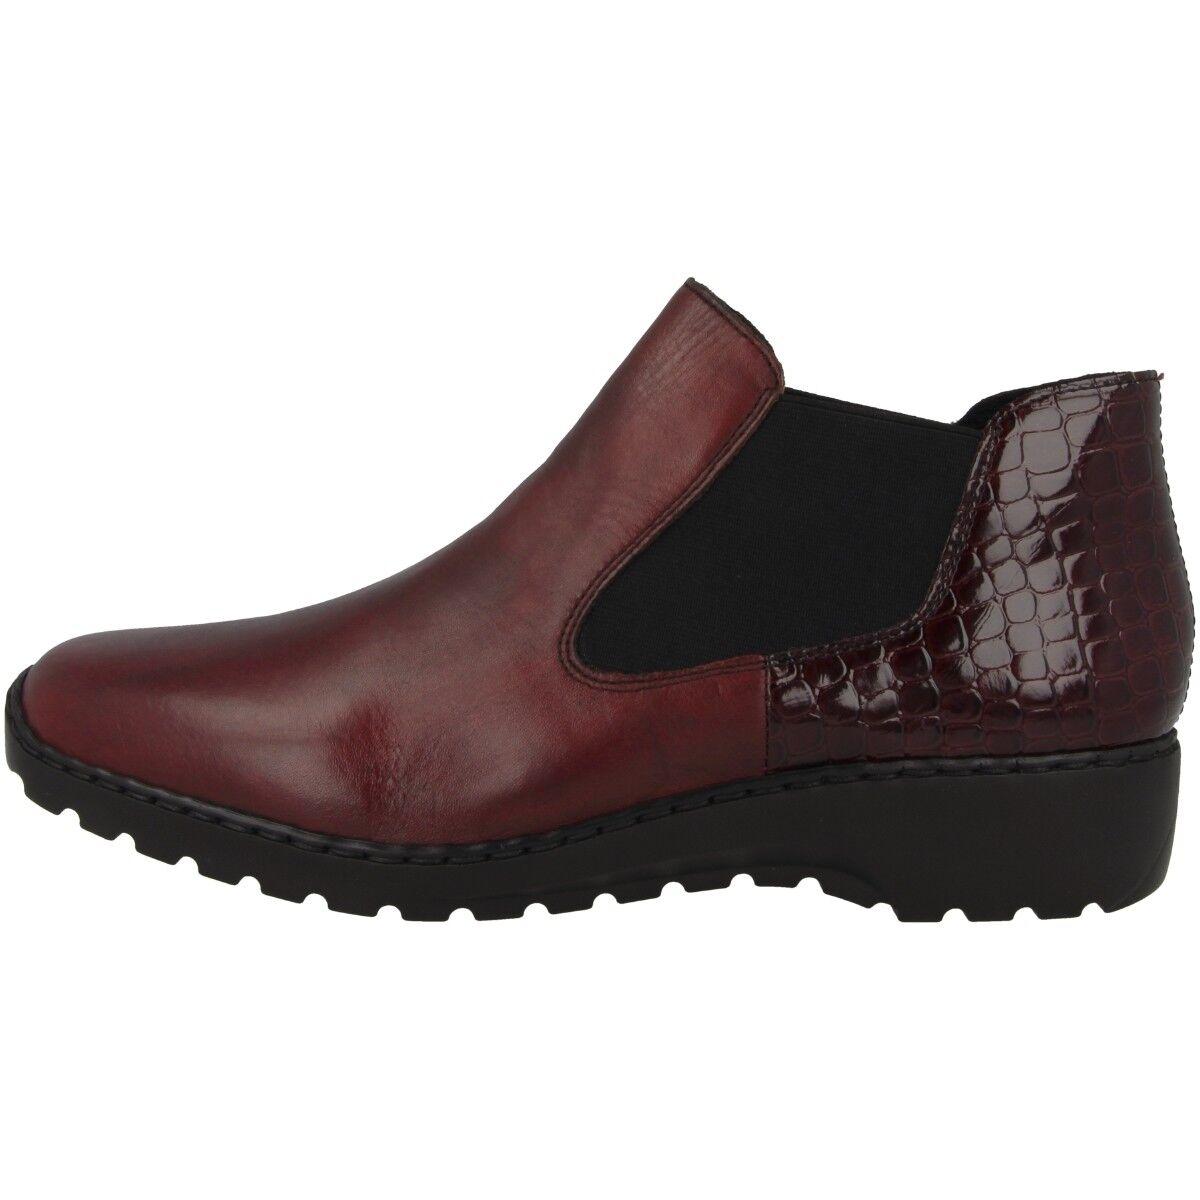 Rieker Cristallino-Bahamas Schuhe Antistress Slipper Chelsea Boot L6090-35